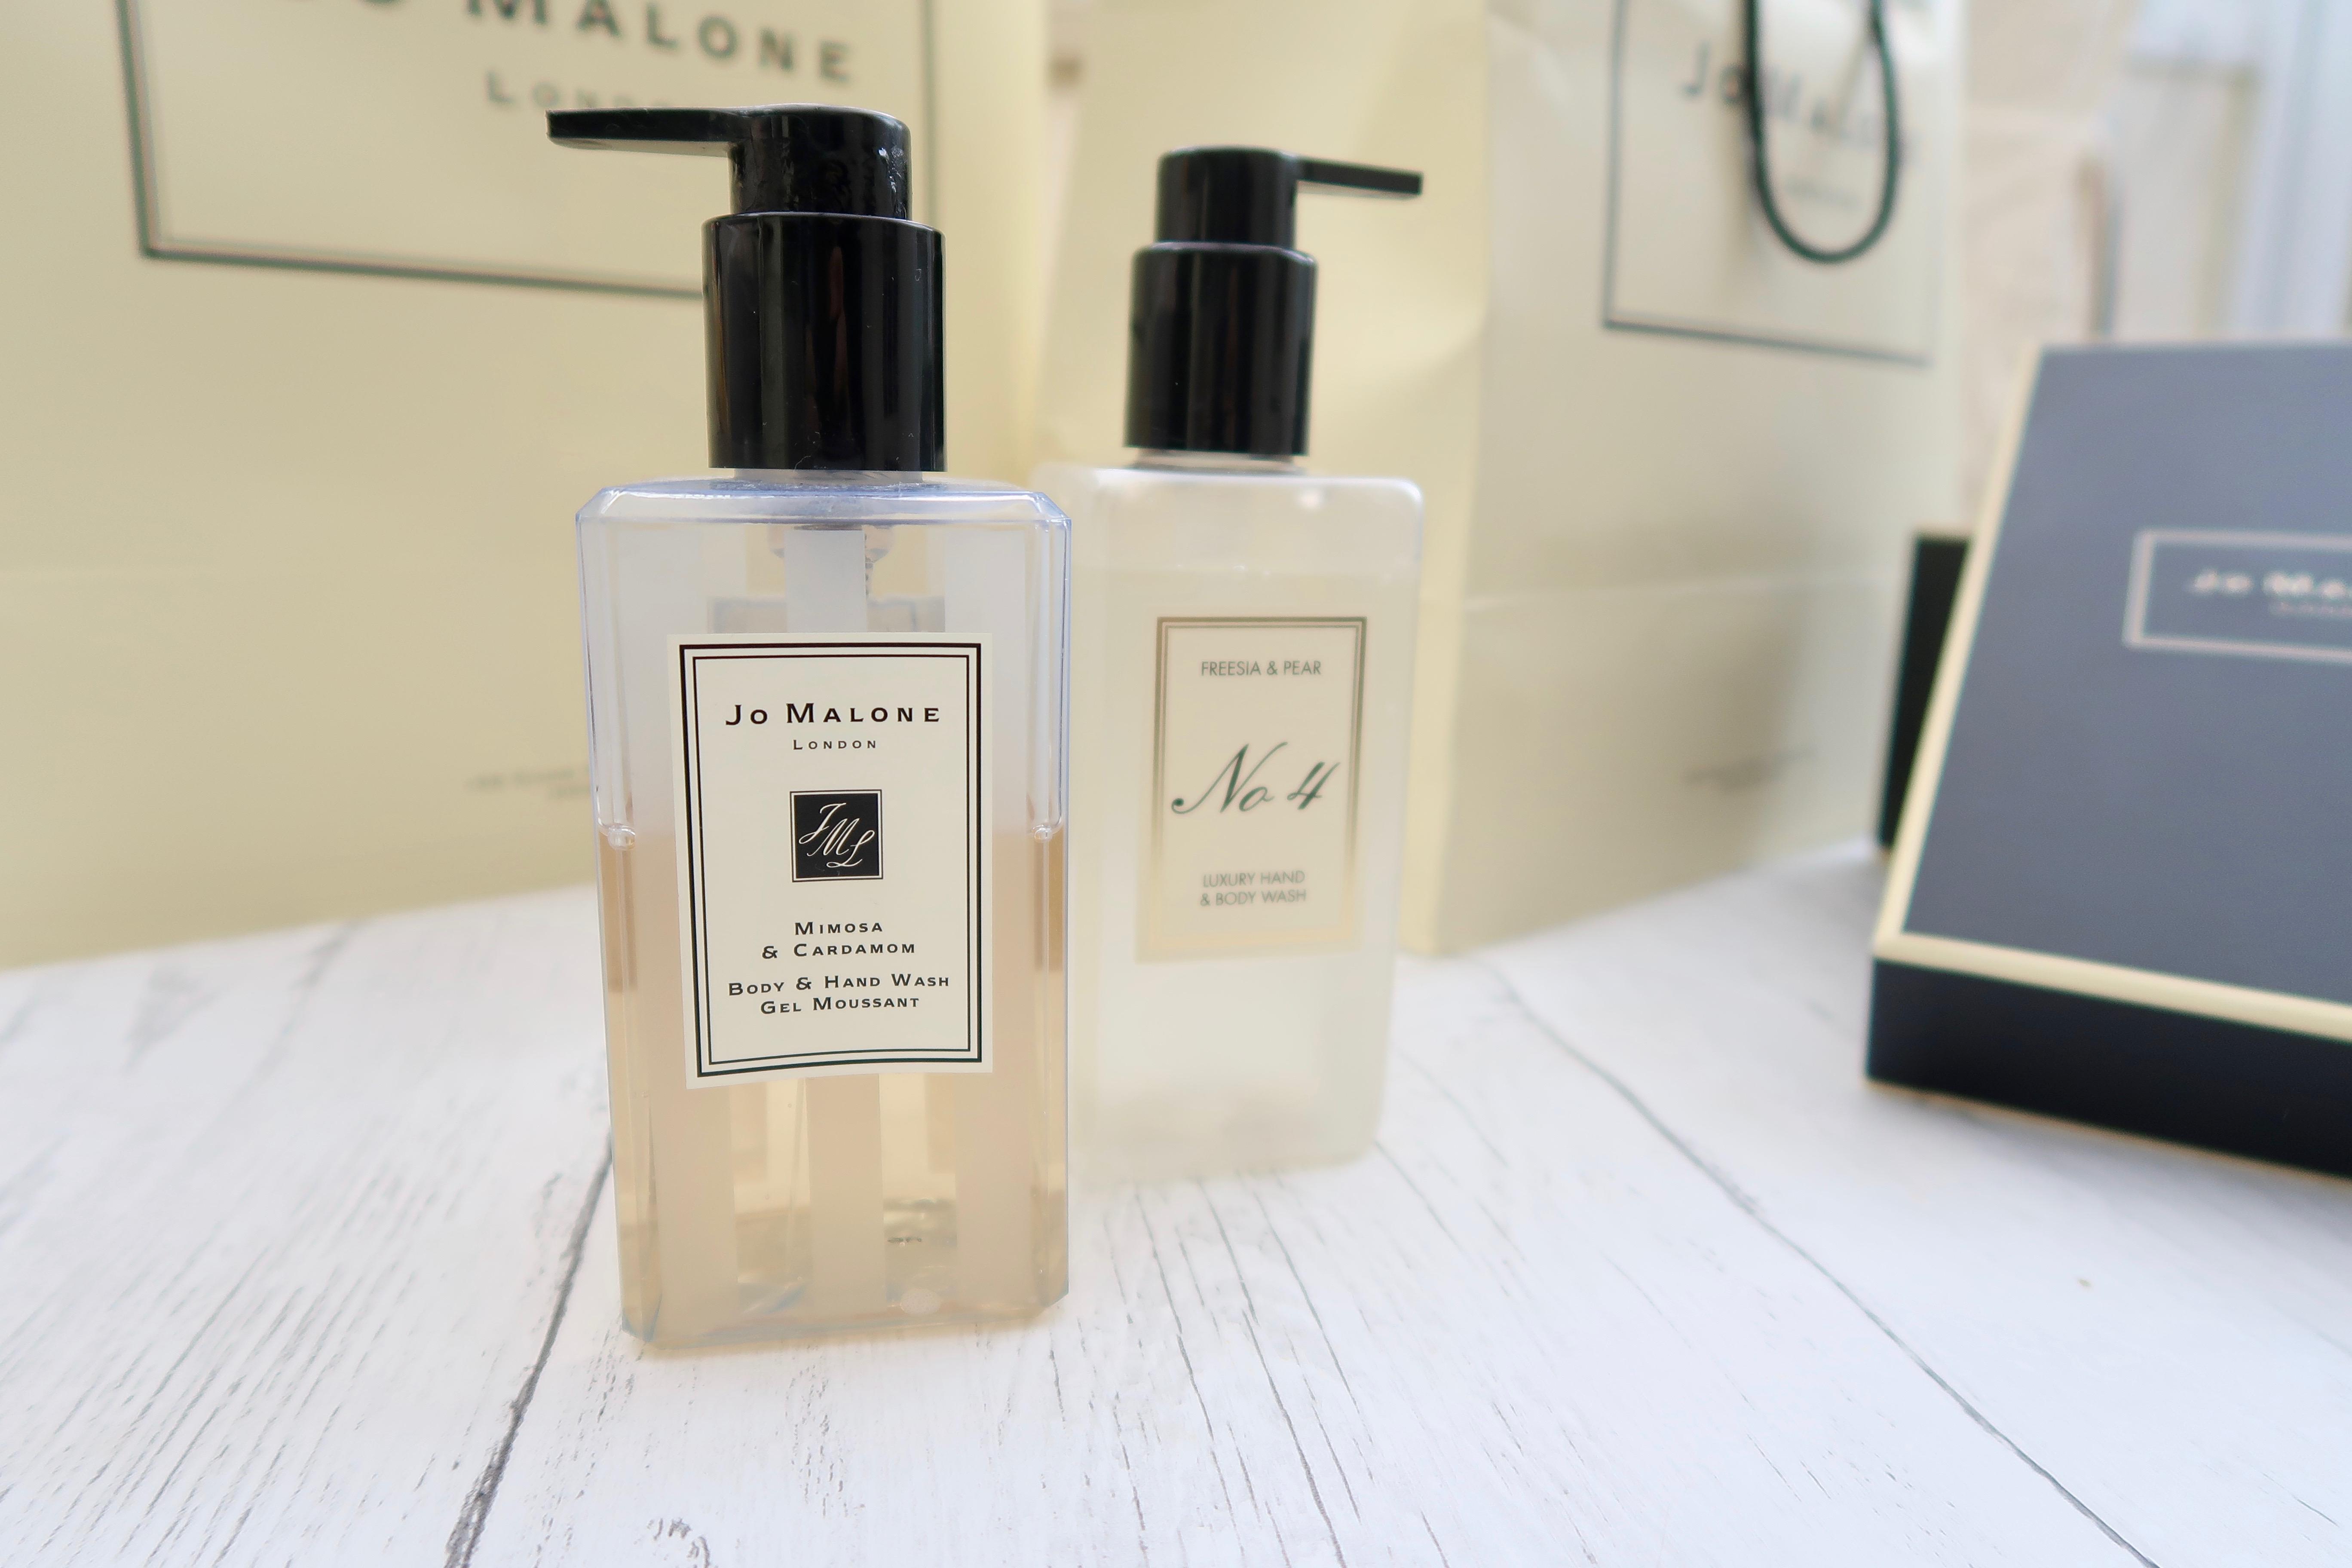 Mimosa & Cardamom Jo Malone vs Aldi Number | Splurge vs Save | Honest Review of the new Aldi bath & body range | Elle Blonde Luxury Lifestyle Destination Blog